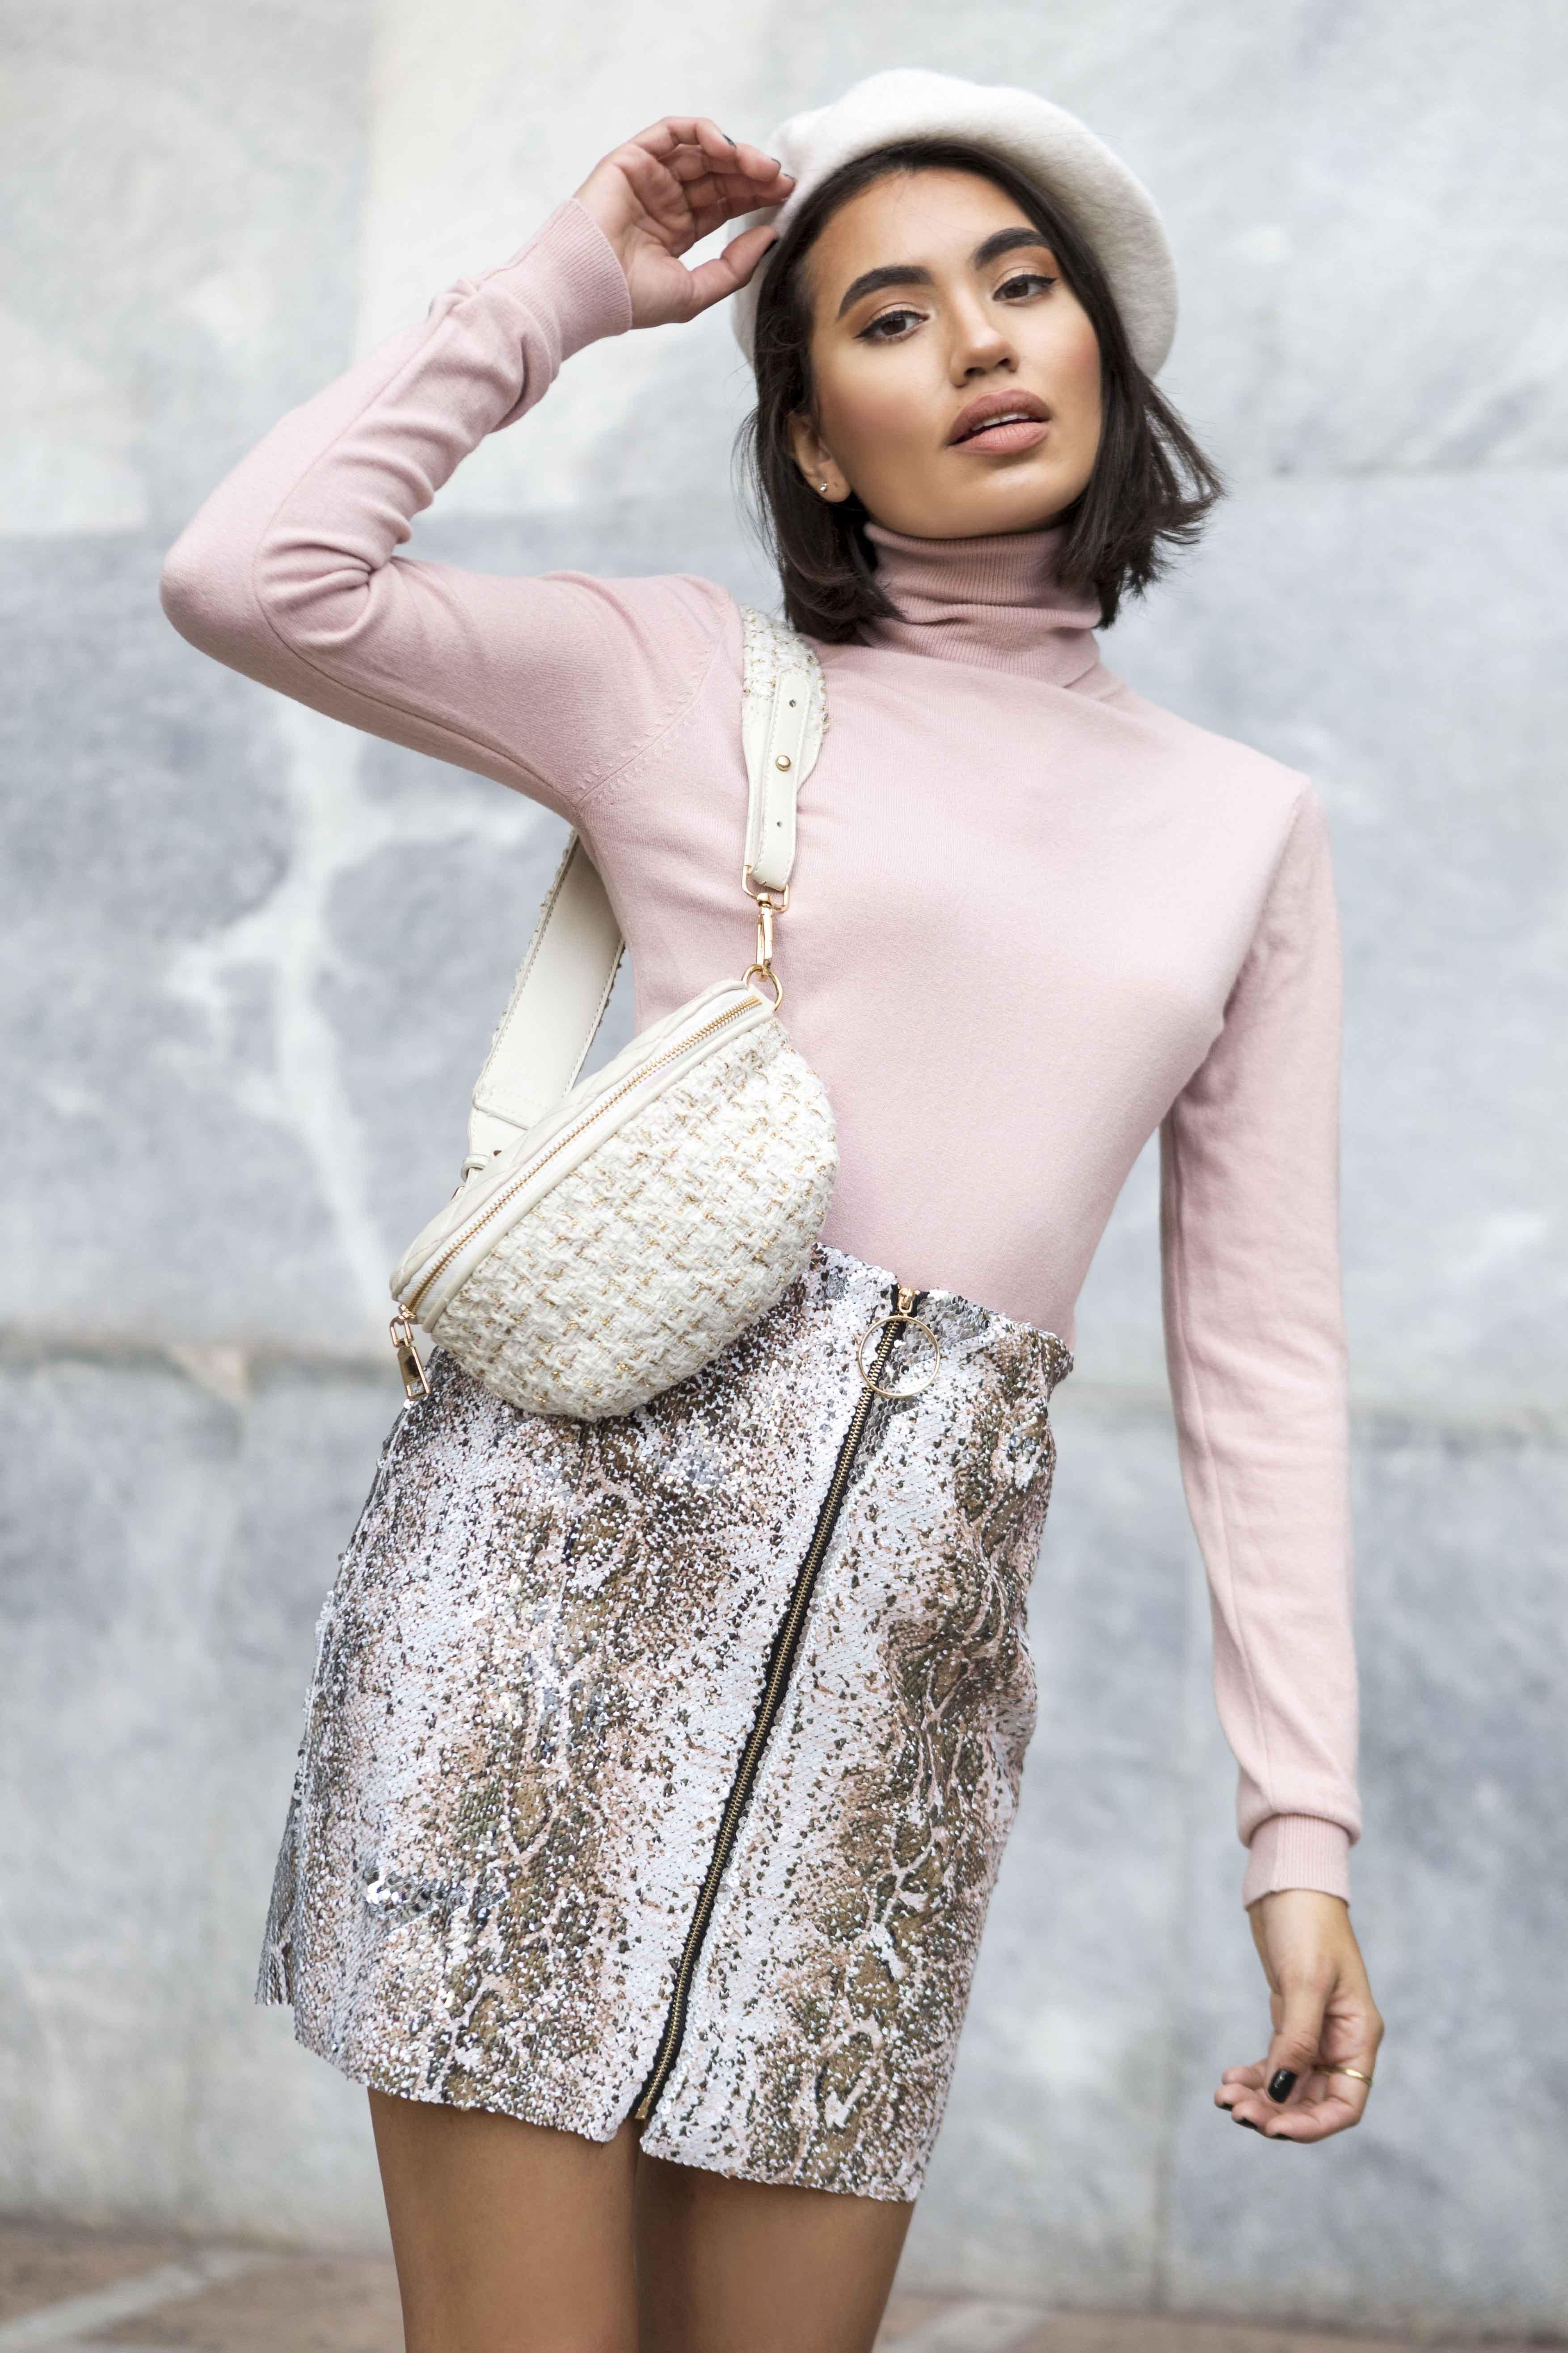 a9303cf0291 SNAKE PRINT ΦΟΥΣΤΑ ΠΑΓΙΕΤA - CLOTHES -> Φούστες   Made of Grace